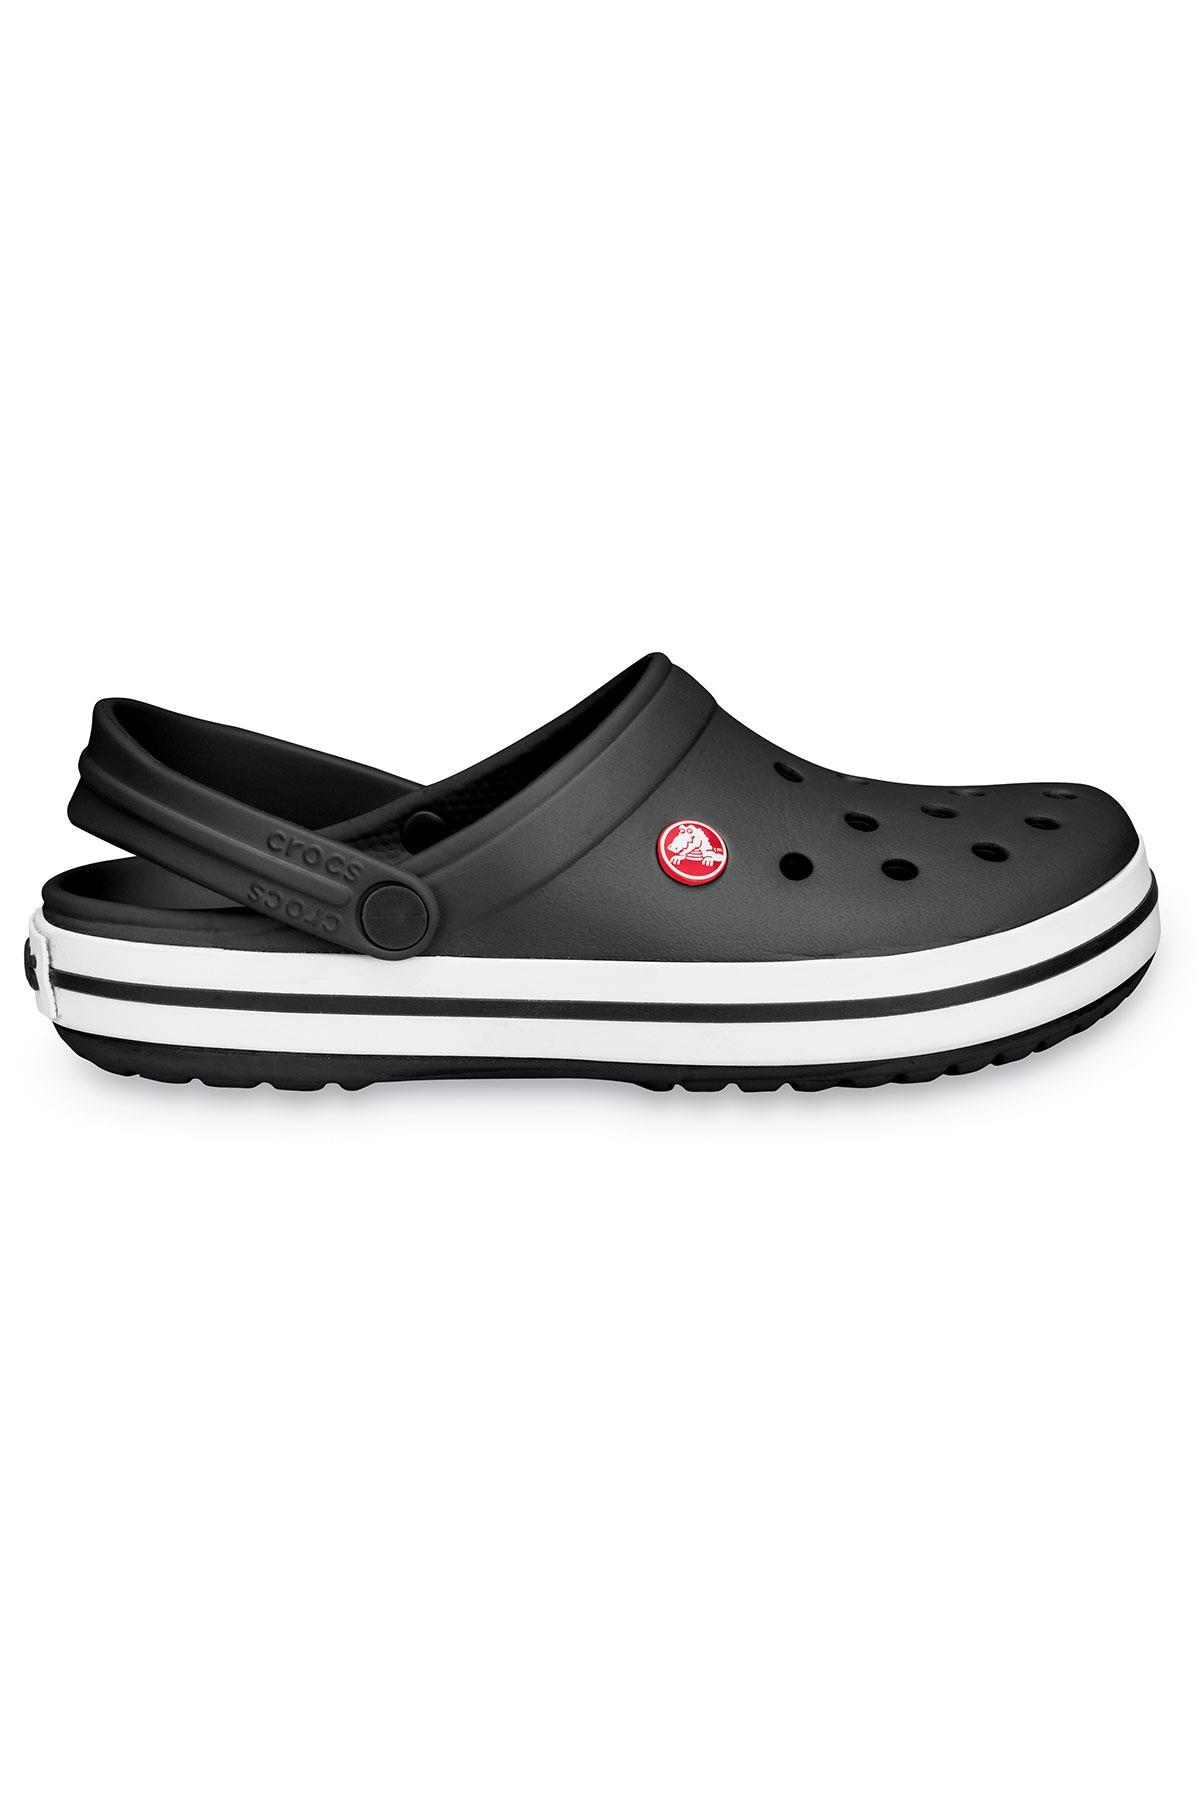 Crocs Crocband Comfortable Clogs P022546-D34